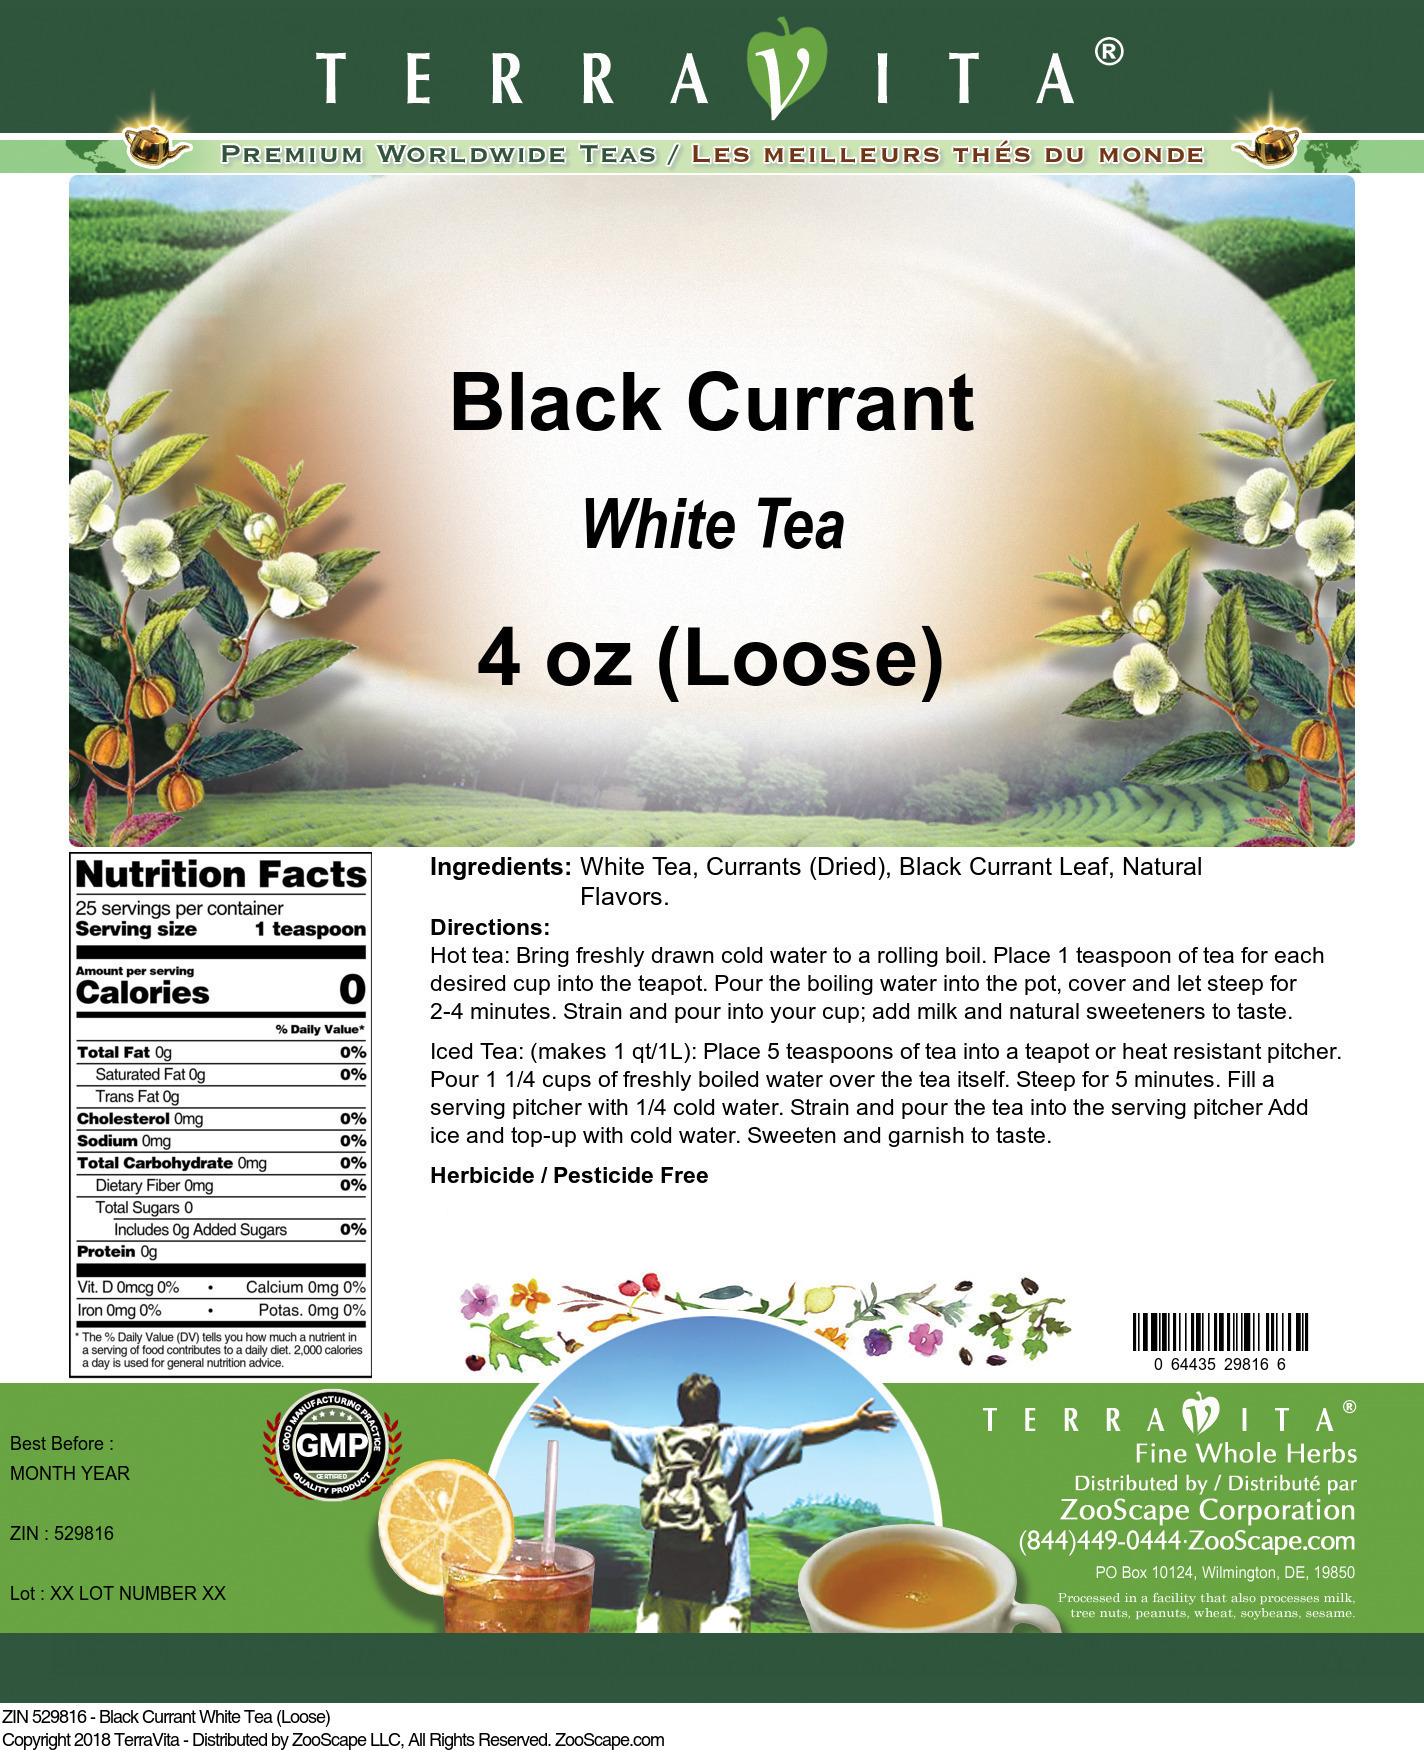 Black Currant White Tea (Loose)